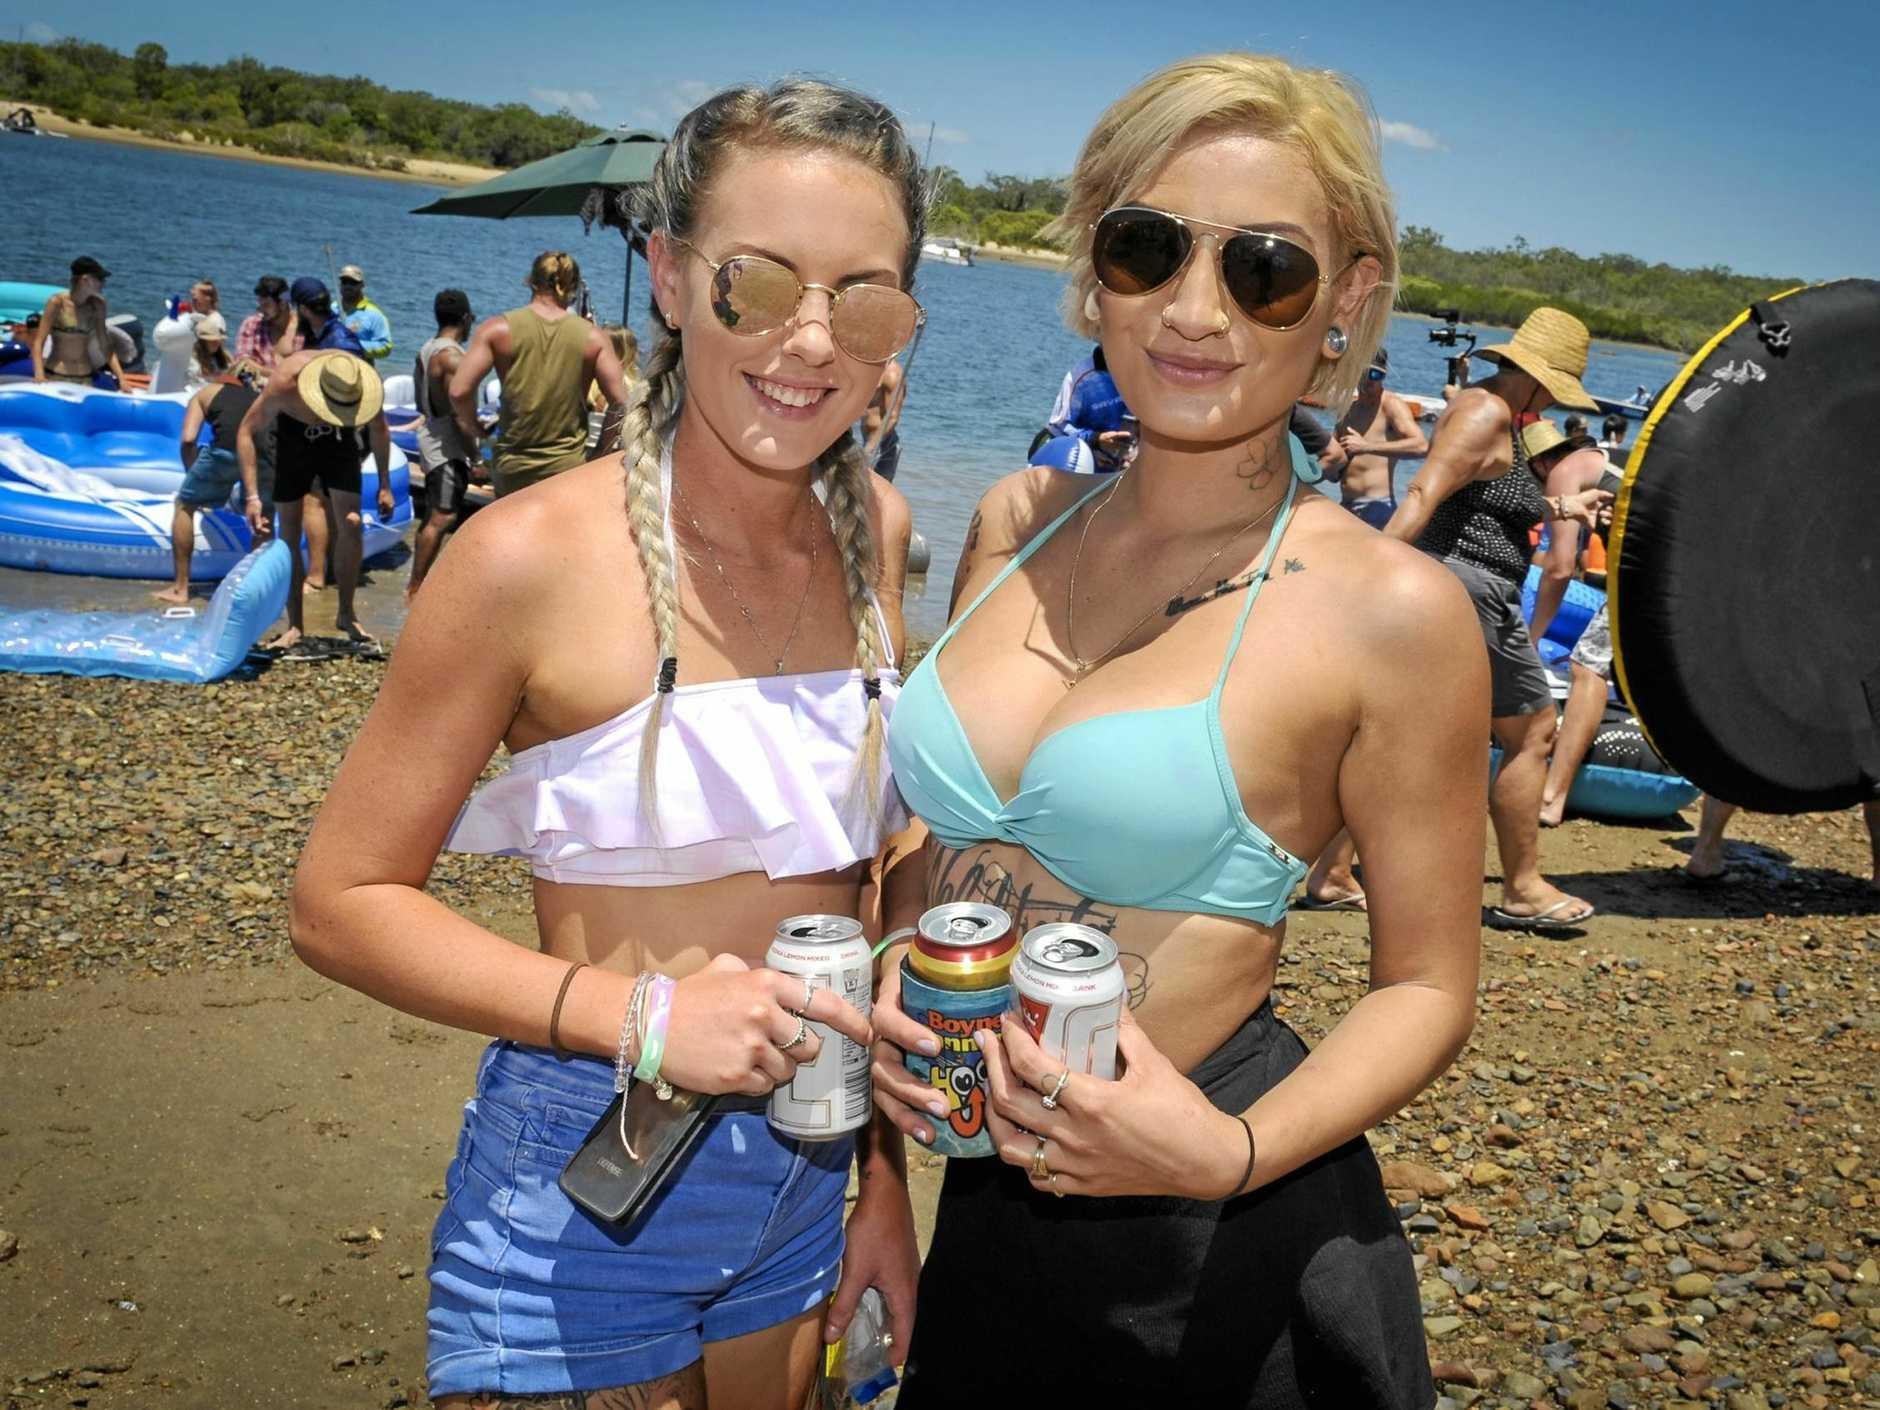 Amy-Lee Beard and Tanisha Smith at the Boyne Island Raft Party, 10 February 2018.